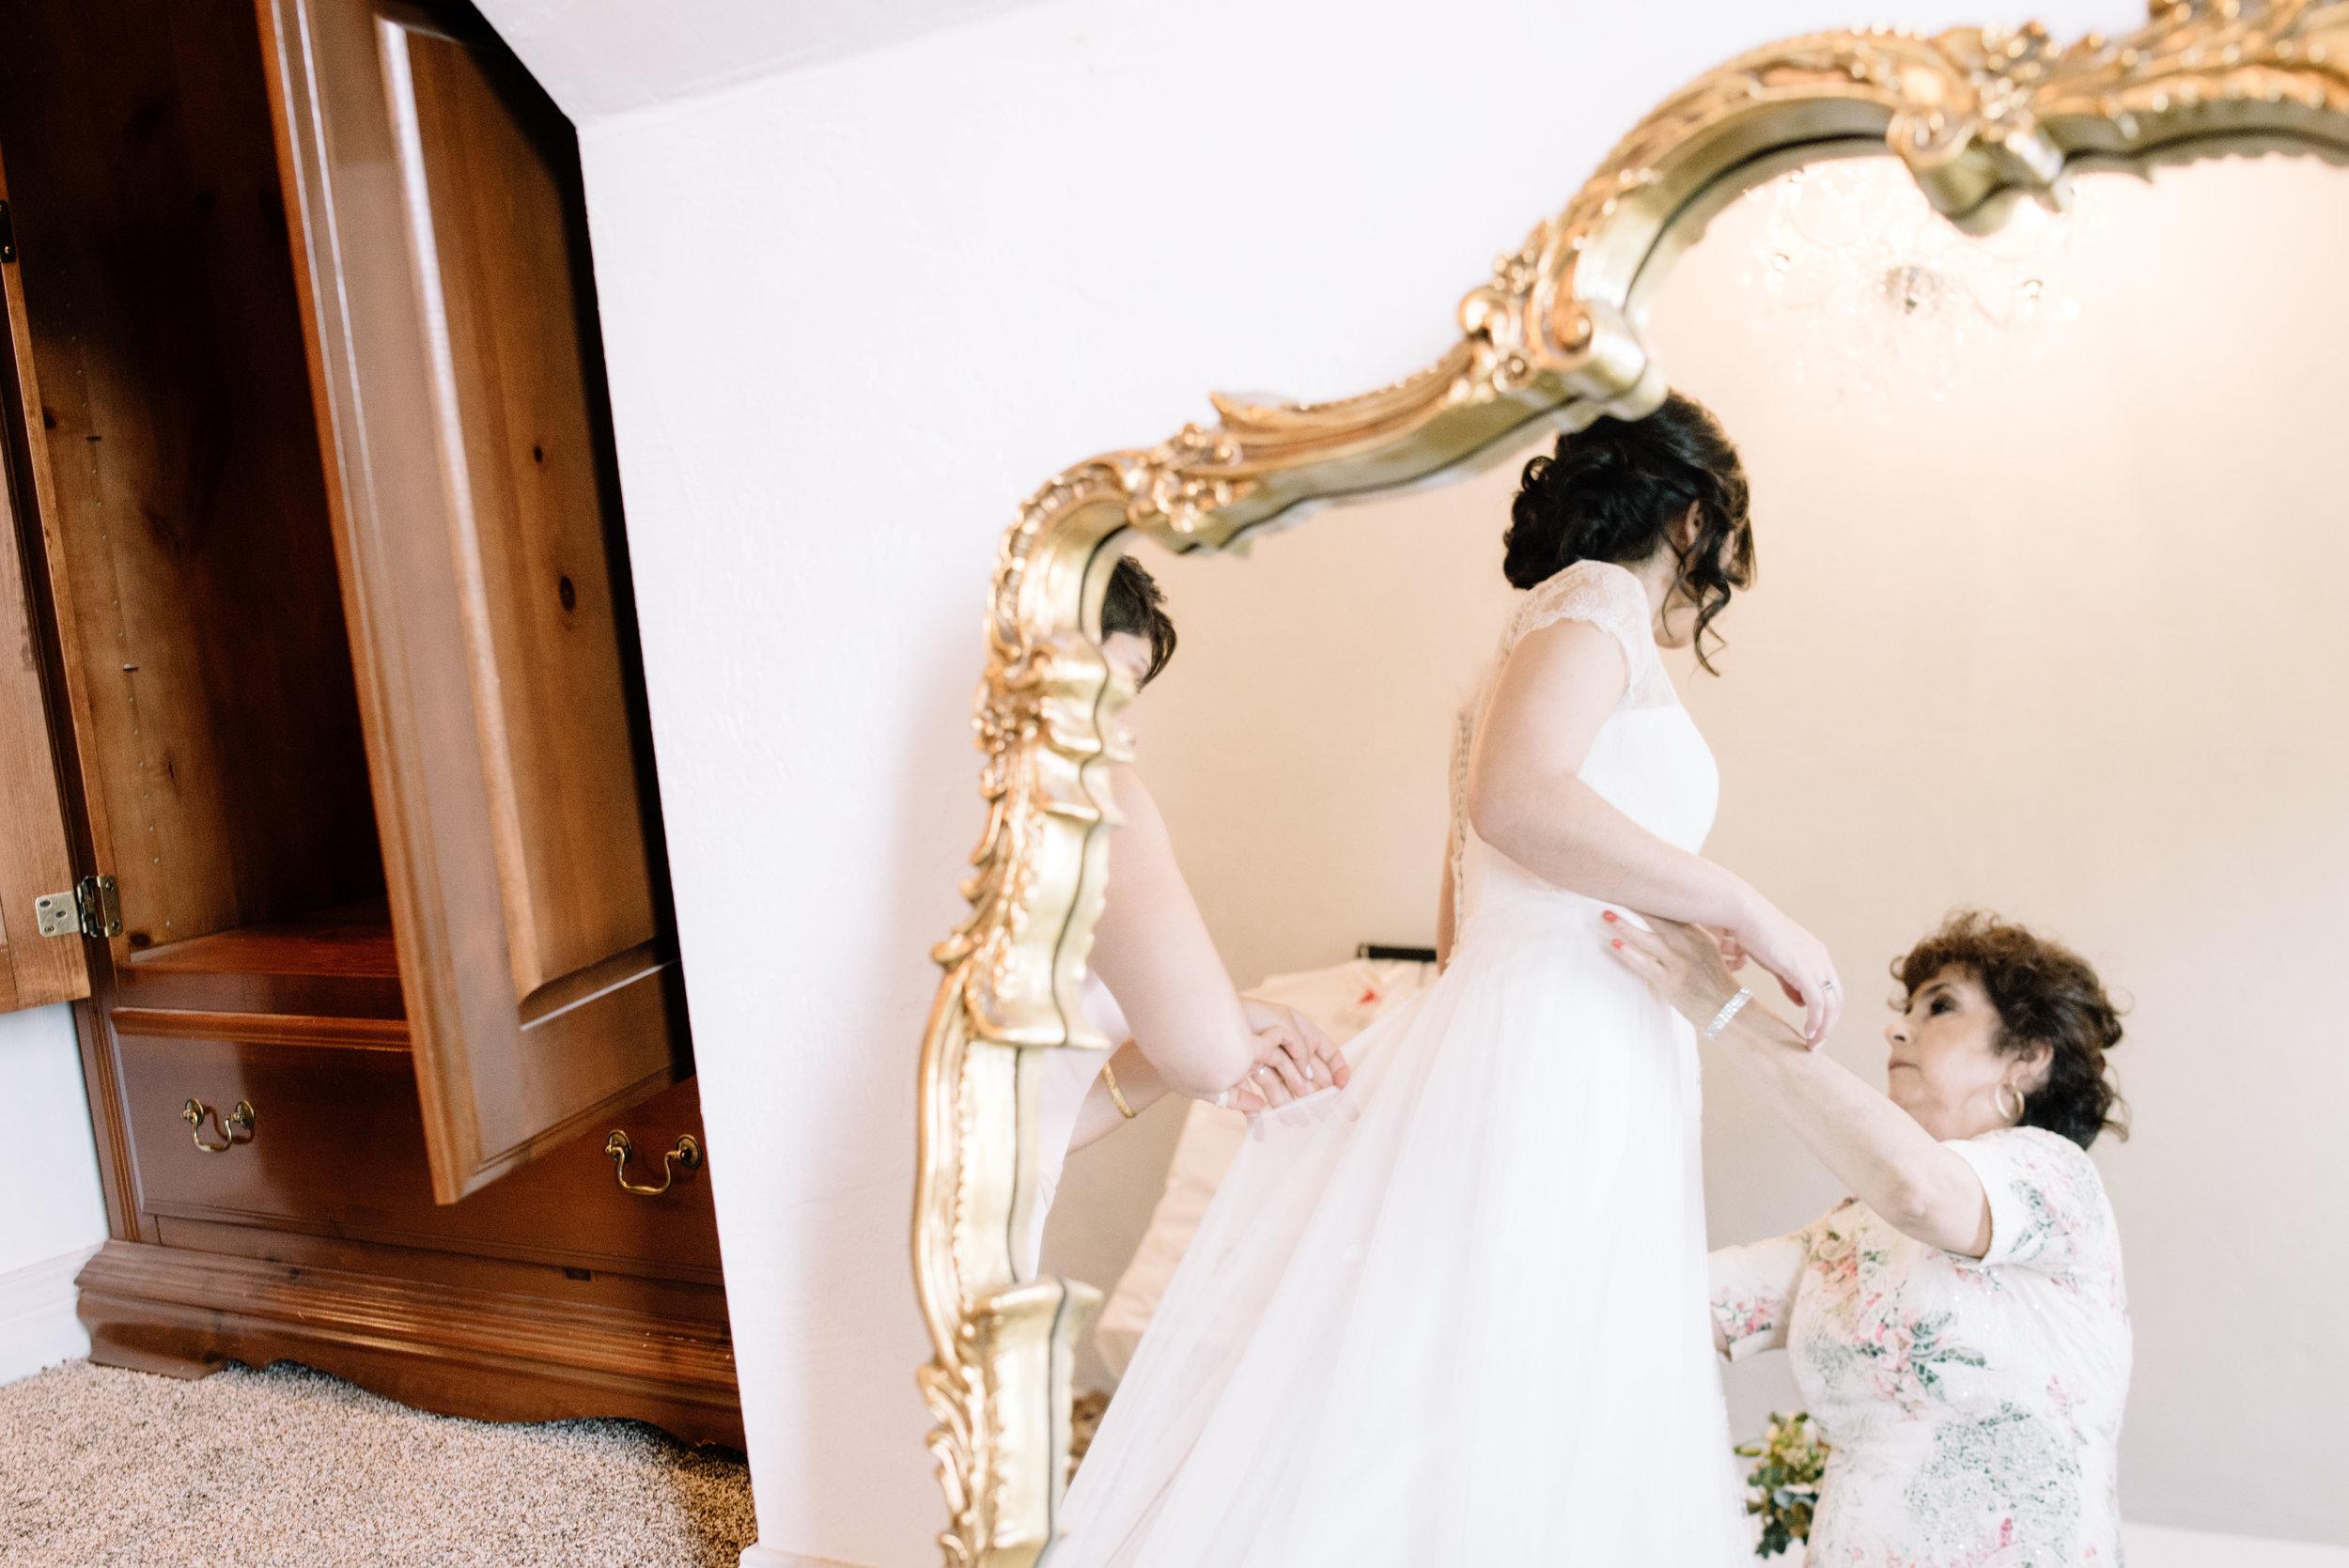 Ana-Dan-Blog-Indianapolis-Wedding-14.jpg